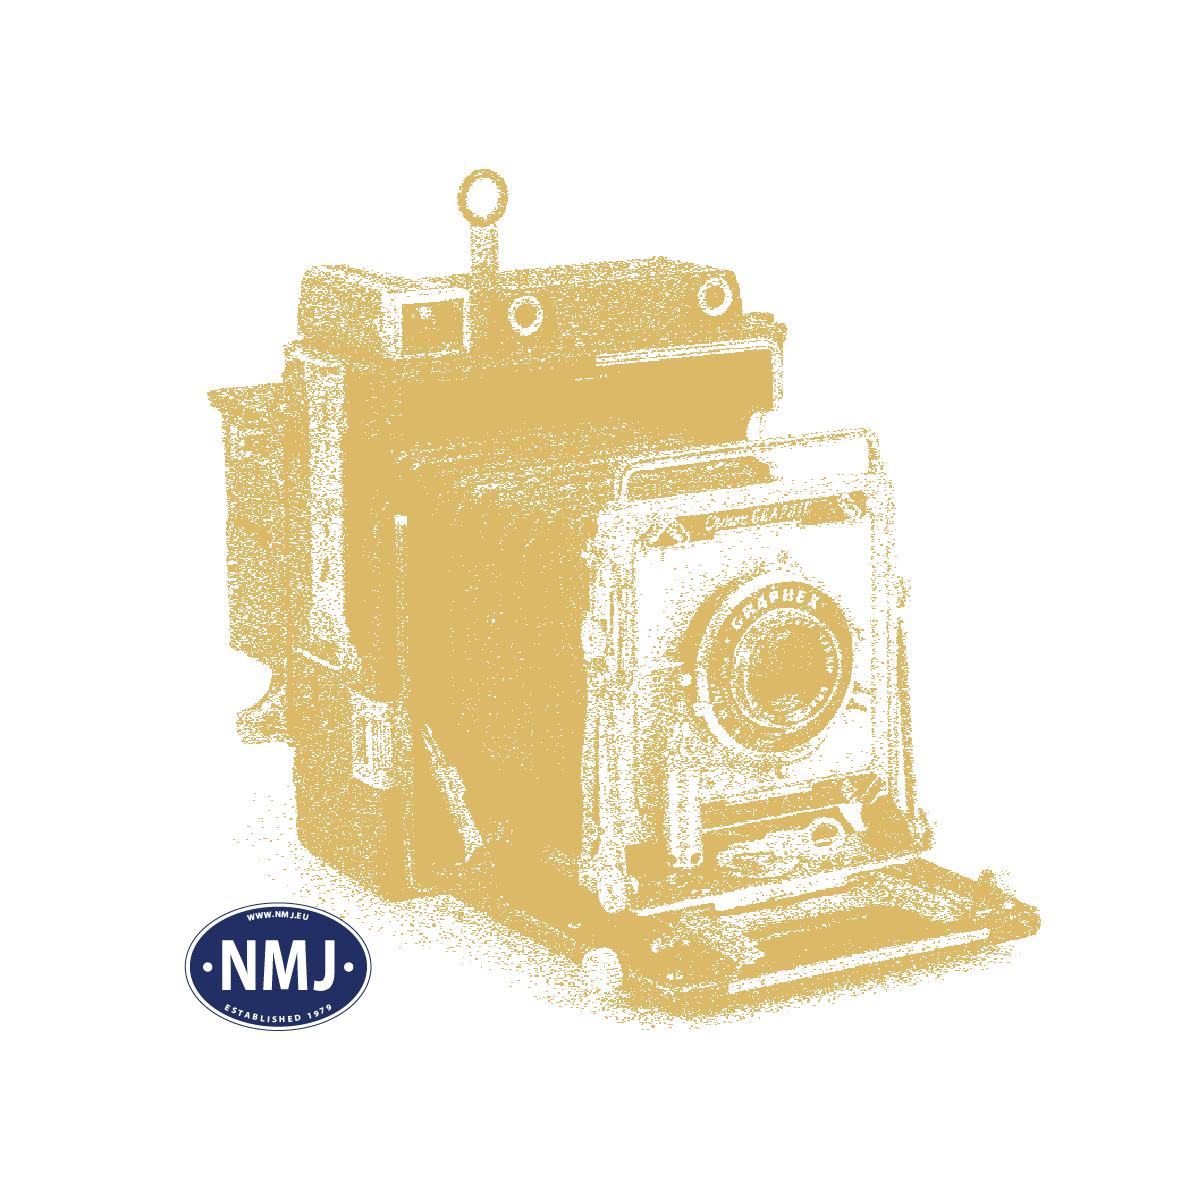 ESU58816 - Loksound Micro V5, Alle Grensesnitt (NEM651/NEM652/Next18/PluX16)